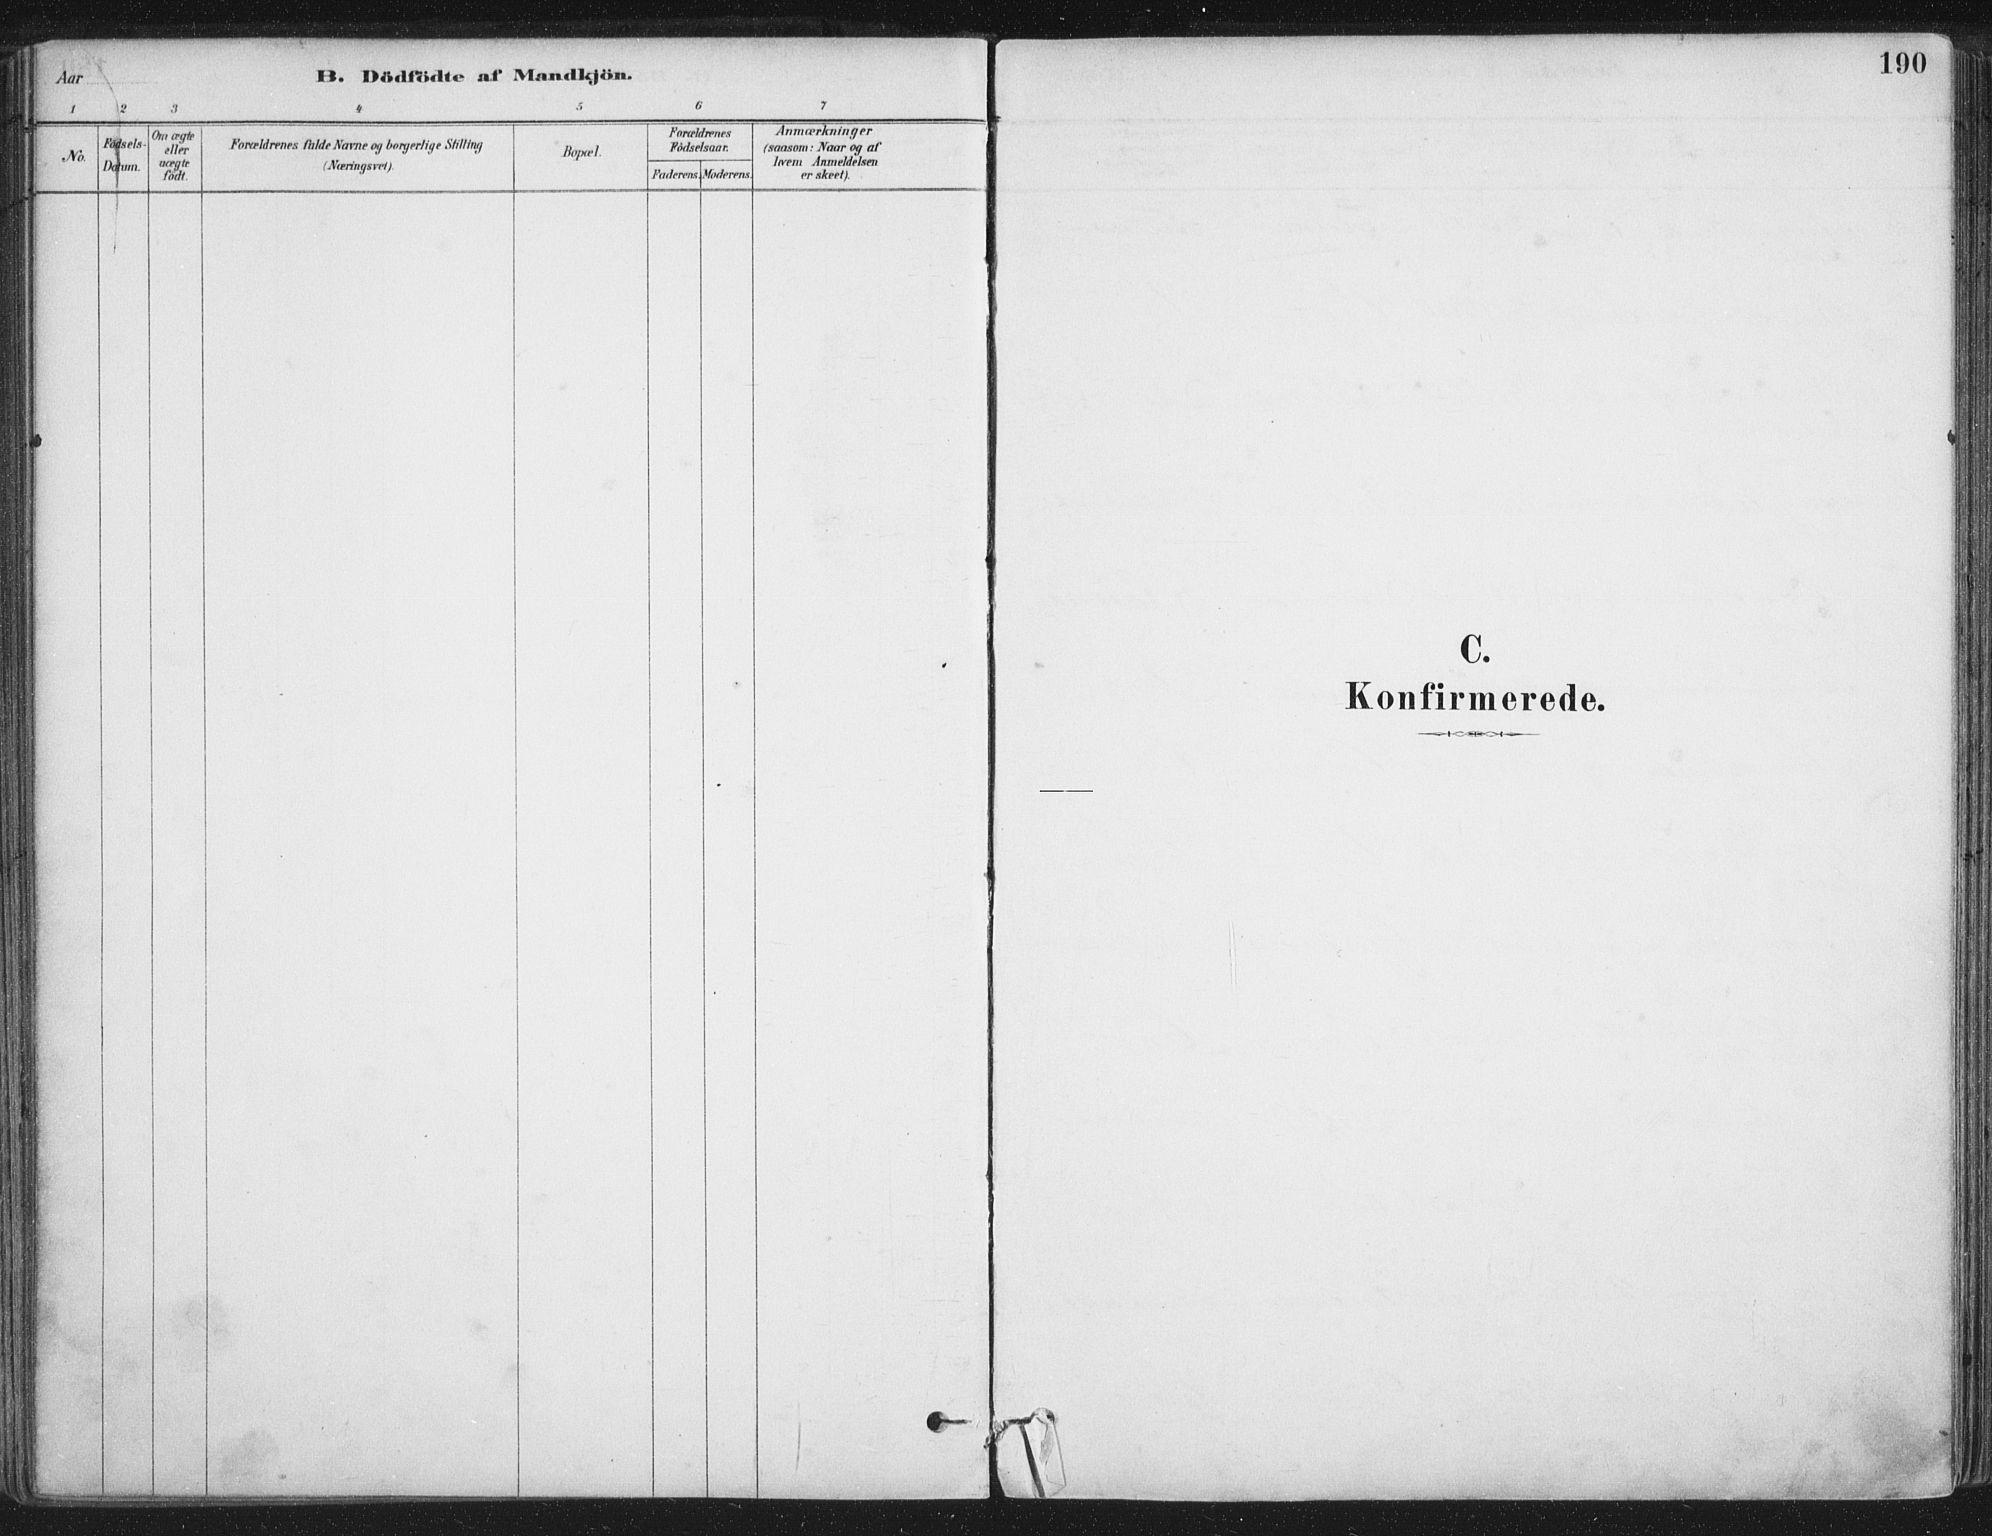 SAT, Ministerialprotokoller, klokkerbøker og fødselsregistre - Nordland, 888/L1244: Ministerialbok nr. 888A10, 1880-1890, s. 190